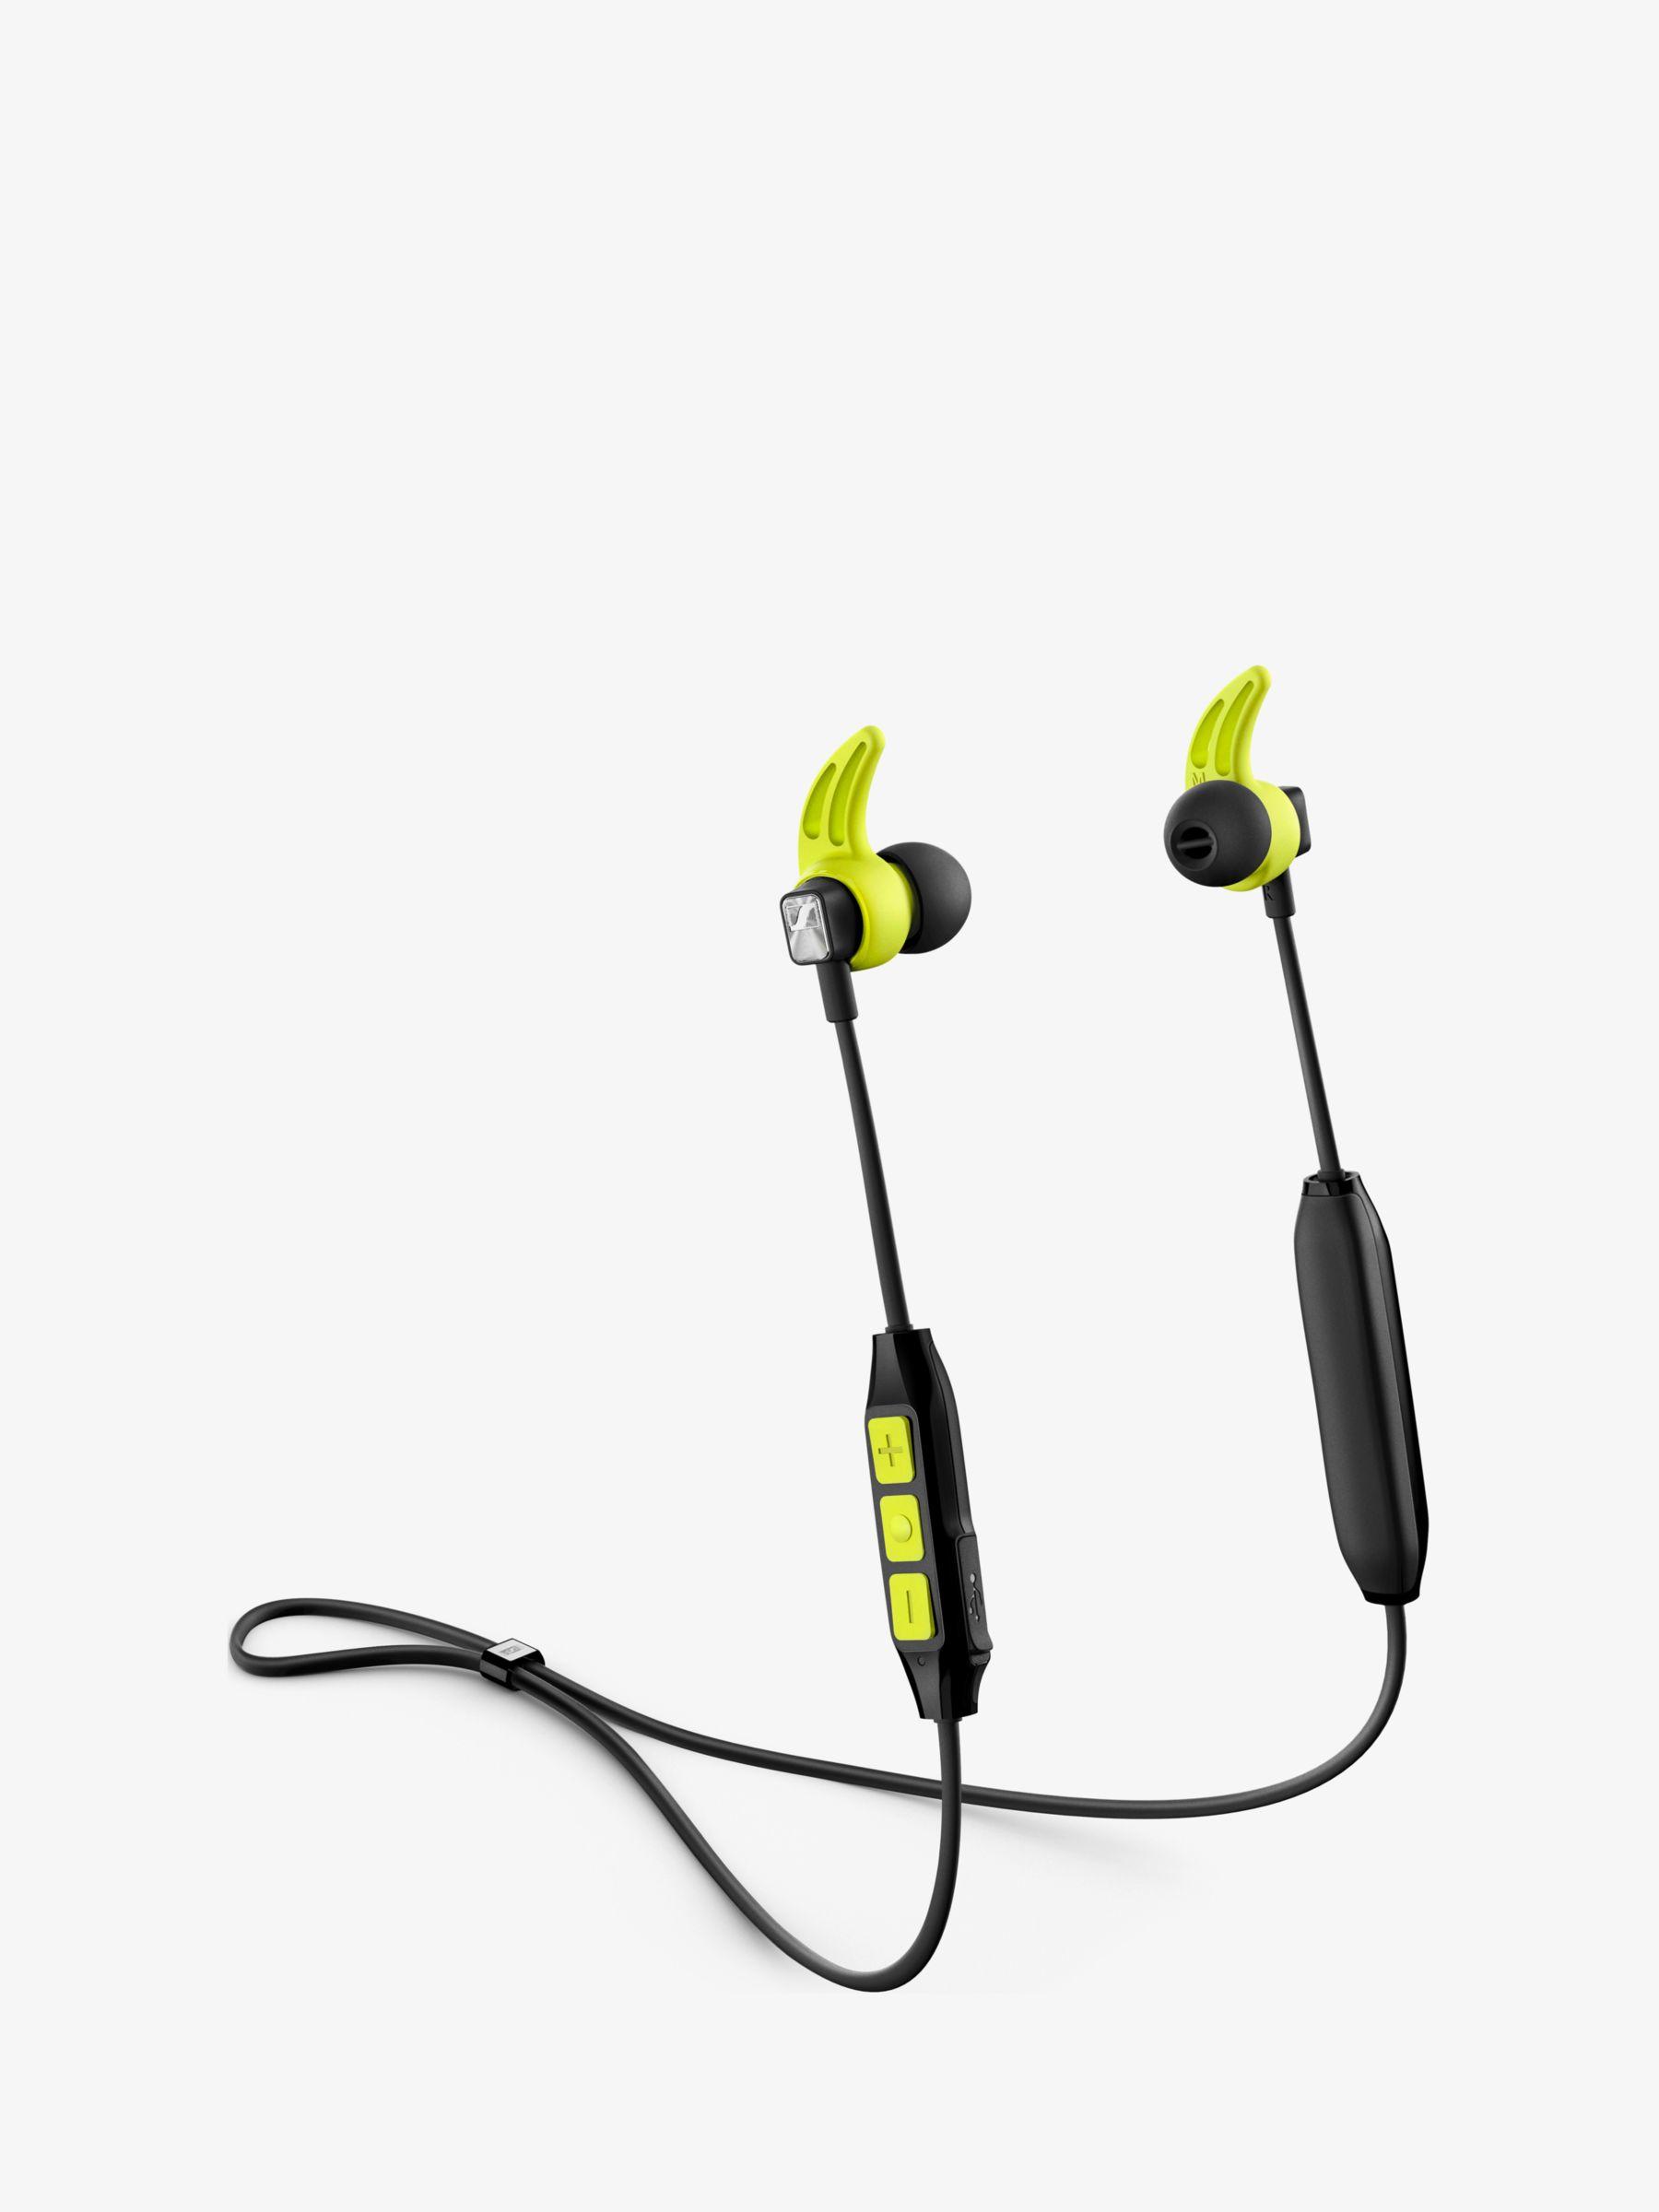 Sennheiser Sennheiser CX SPORT Wireless Bluetooth Splash Resistant Sports In-Ear Headphones with Mic/Remote, Black